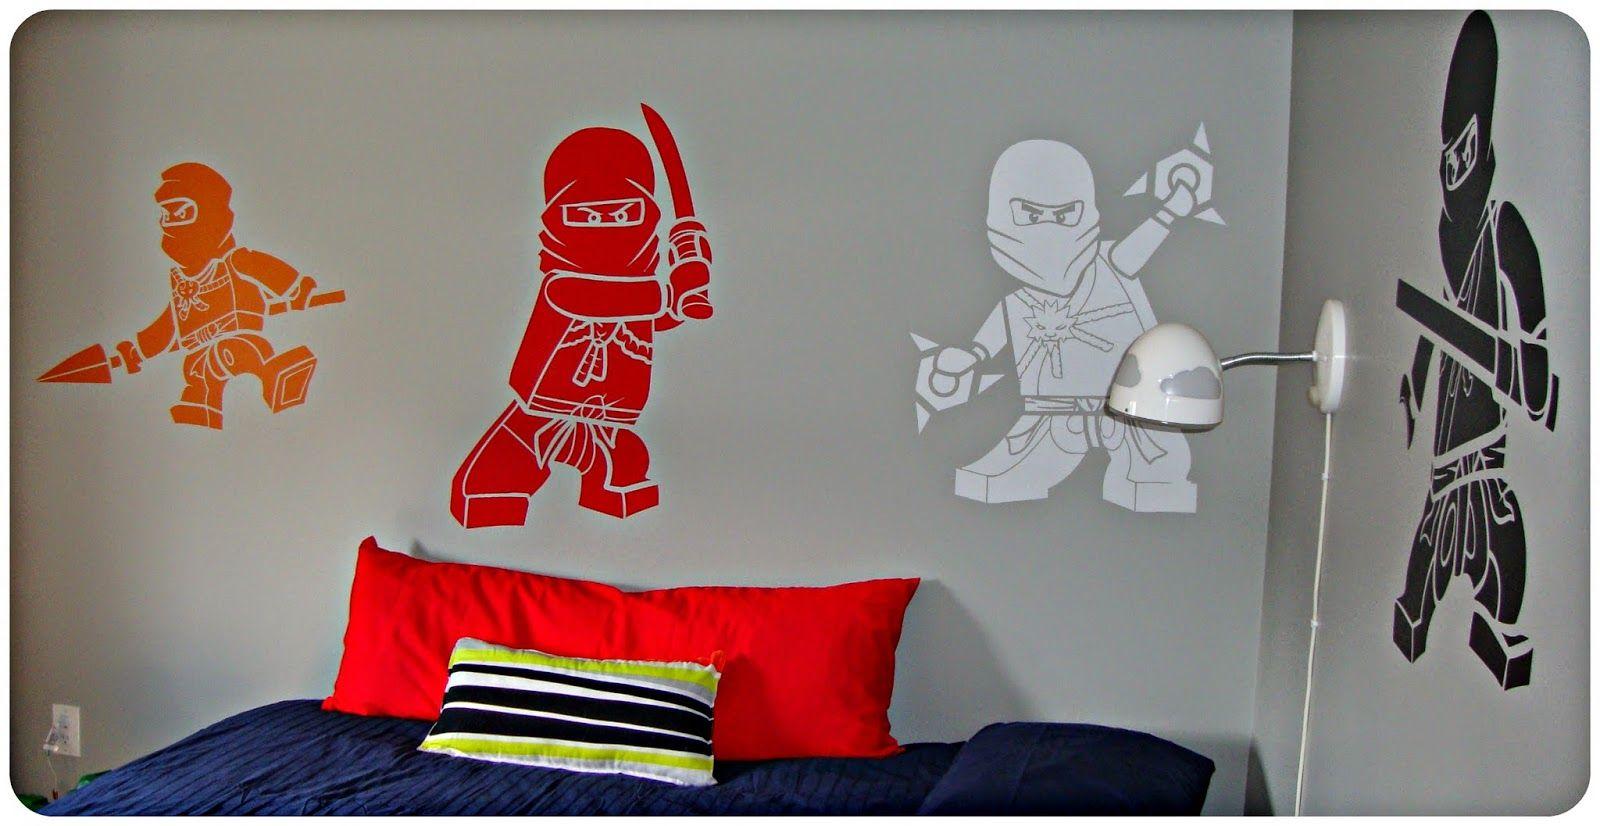 Chambre Lego  Chambre lego, Chambre, Lego